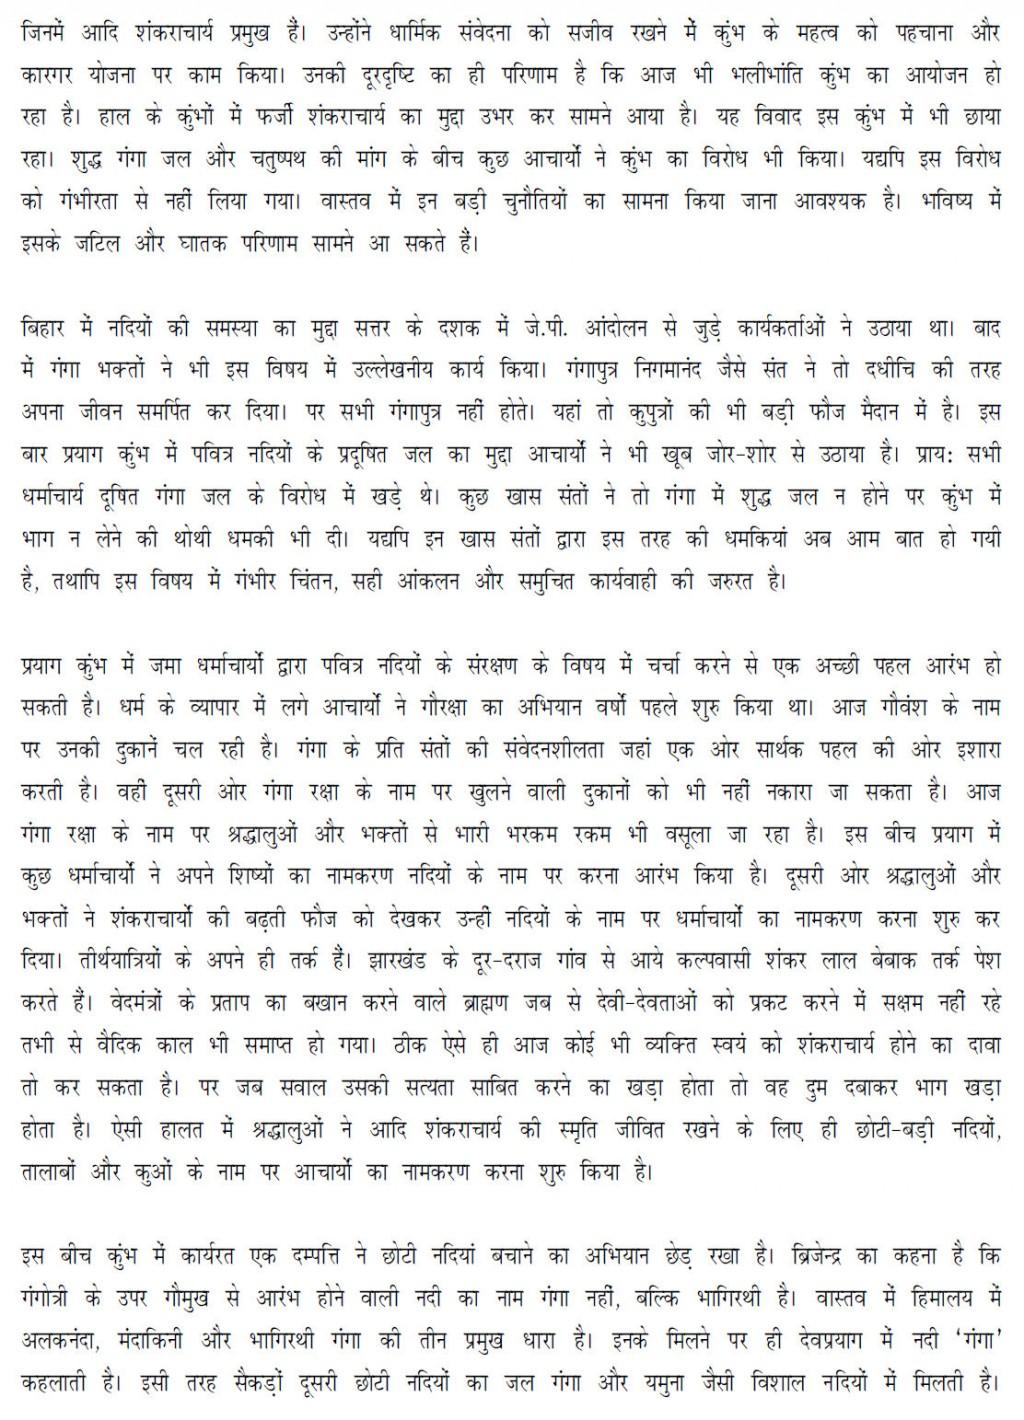 008 Essay Example Kumbh2 Makar Sankranti In Surprising Hindi Pdf Download 2018 Large